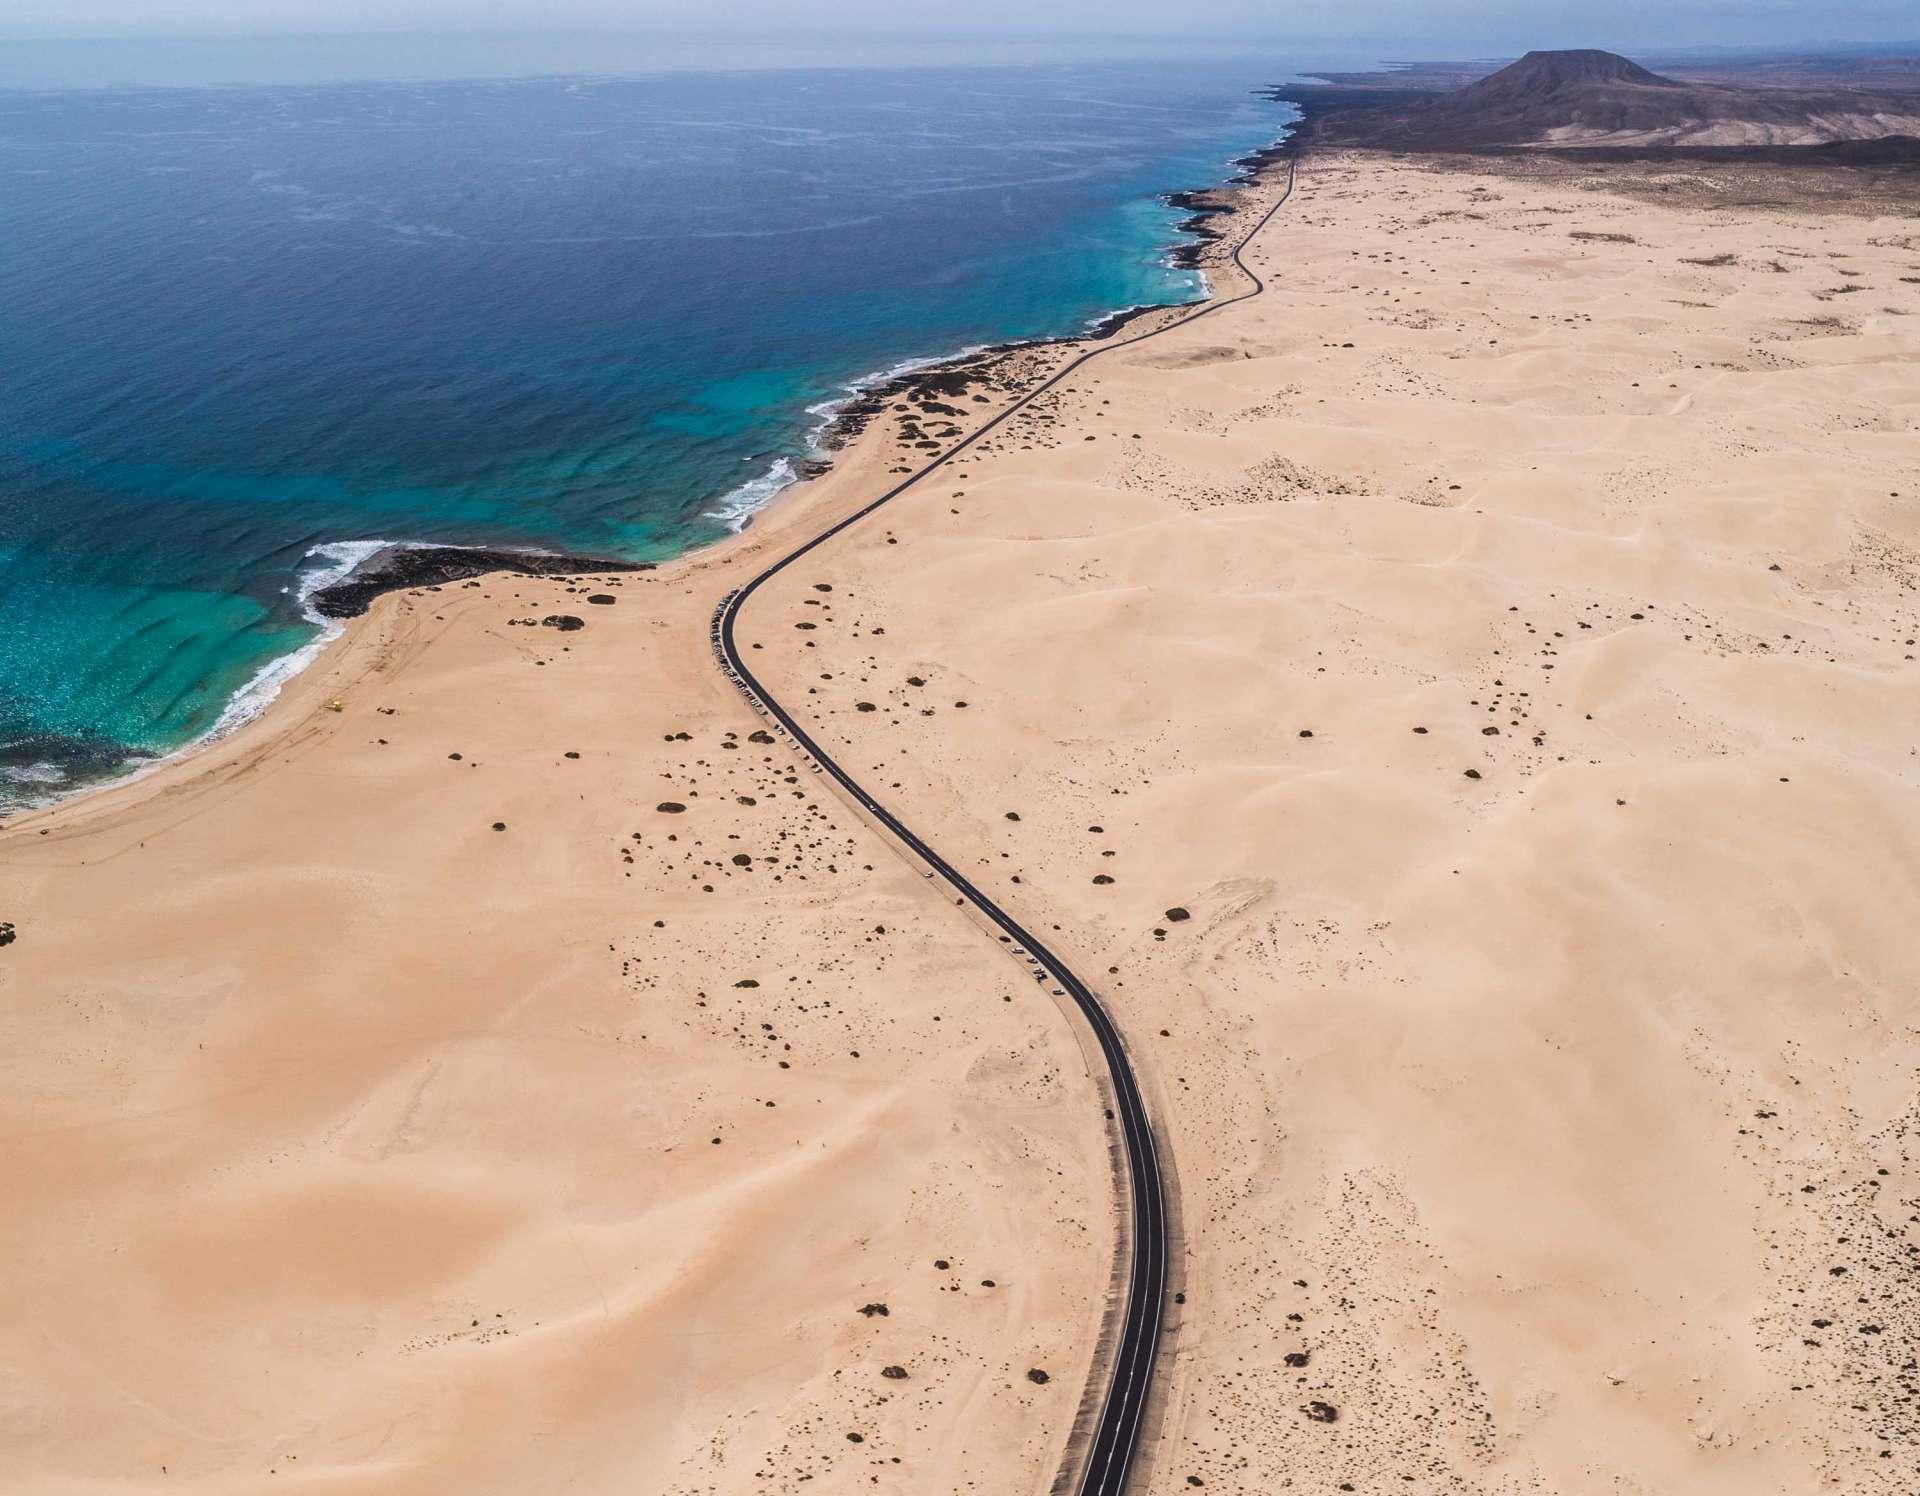 Fuerteventura Corralejo Dunes Park road 2